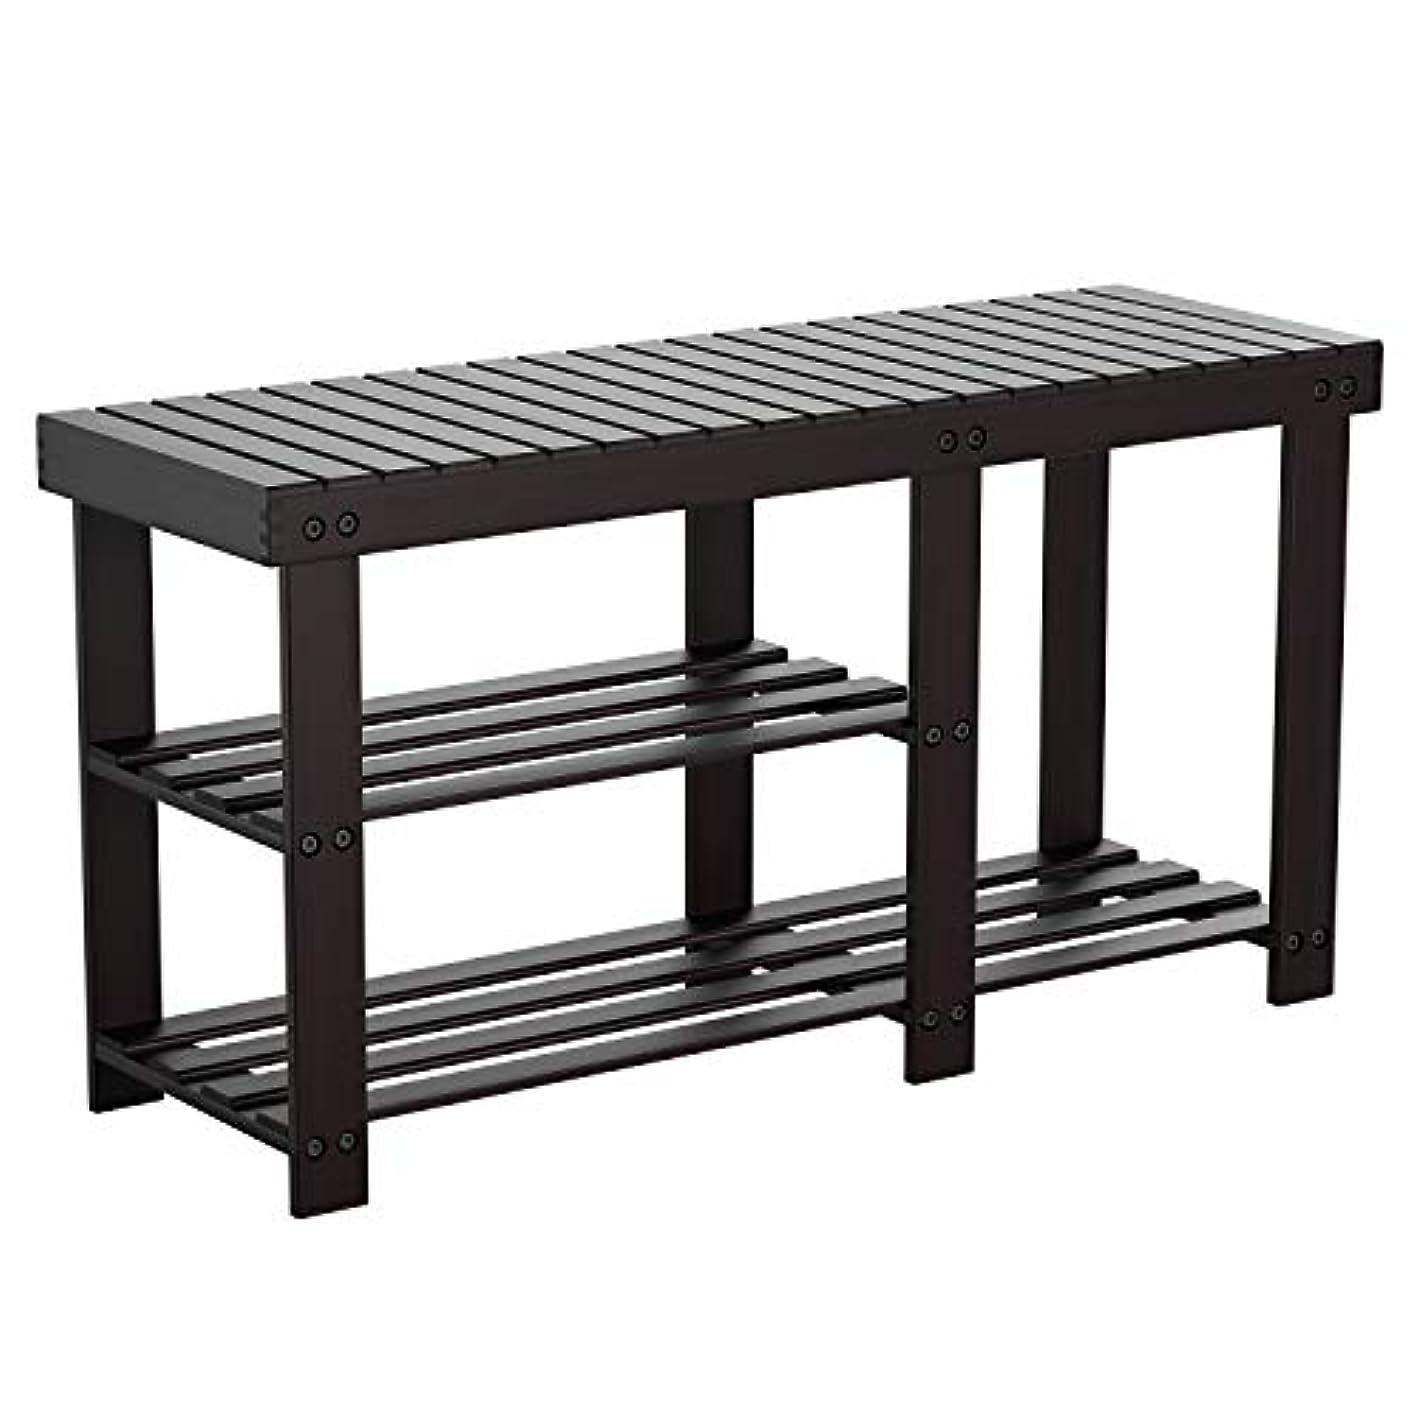 HOMFA Bamboo Shoe Rack Bench 2 Tier Boot Organizing Rack Entryway Storage Shelf Hallway Furniture Retro Color